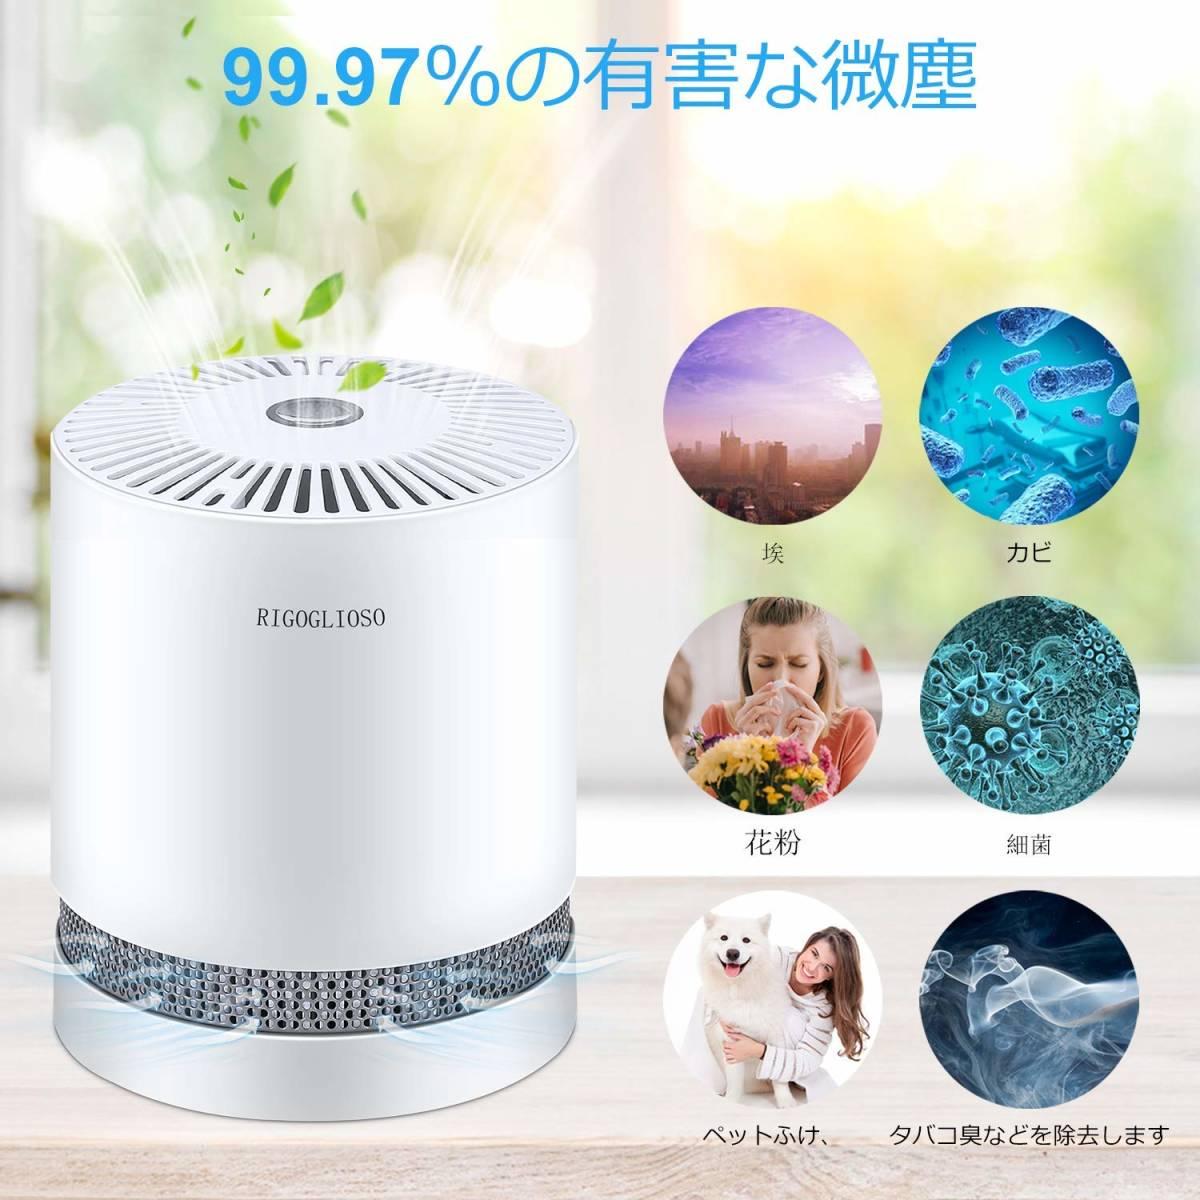 L772 新品 空気清浄機 空調グッズ 秋 冬 空気調節 空気 綺麗 部屋 小型家電_画像5